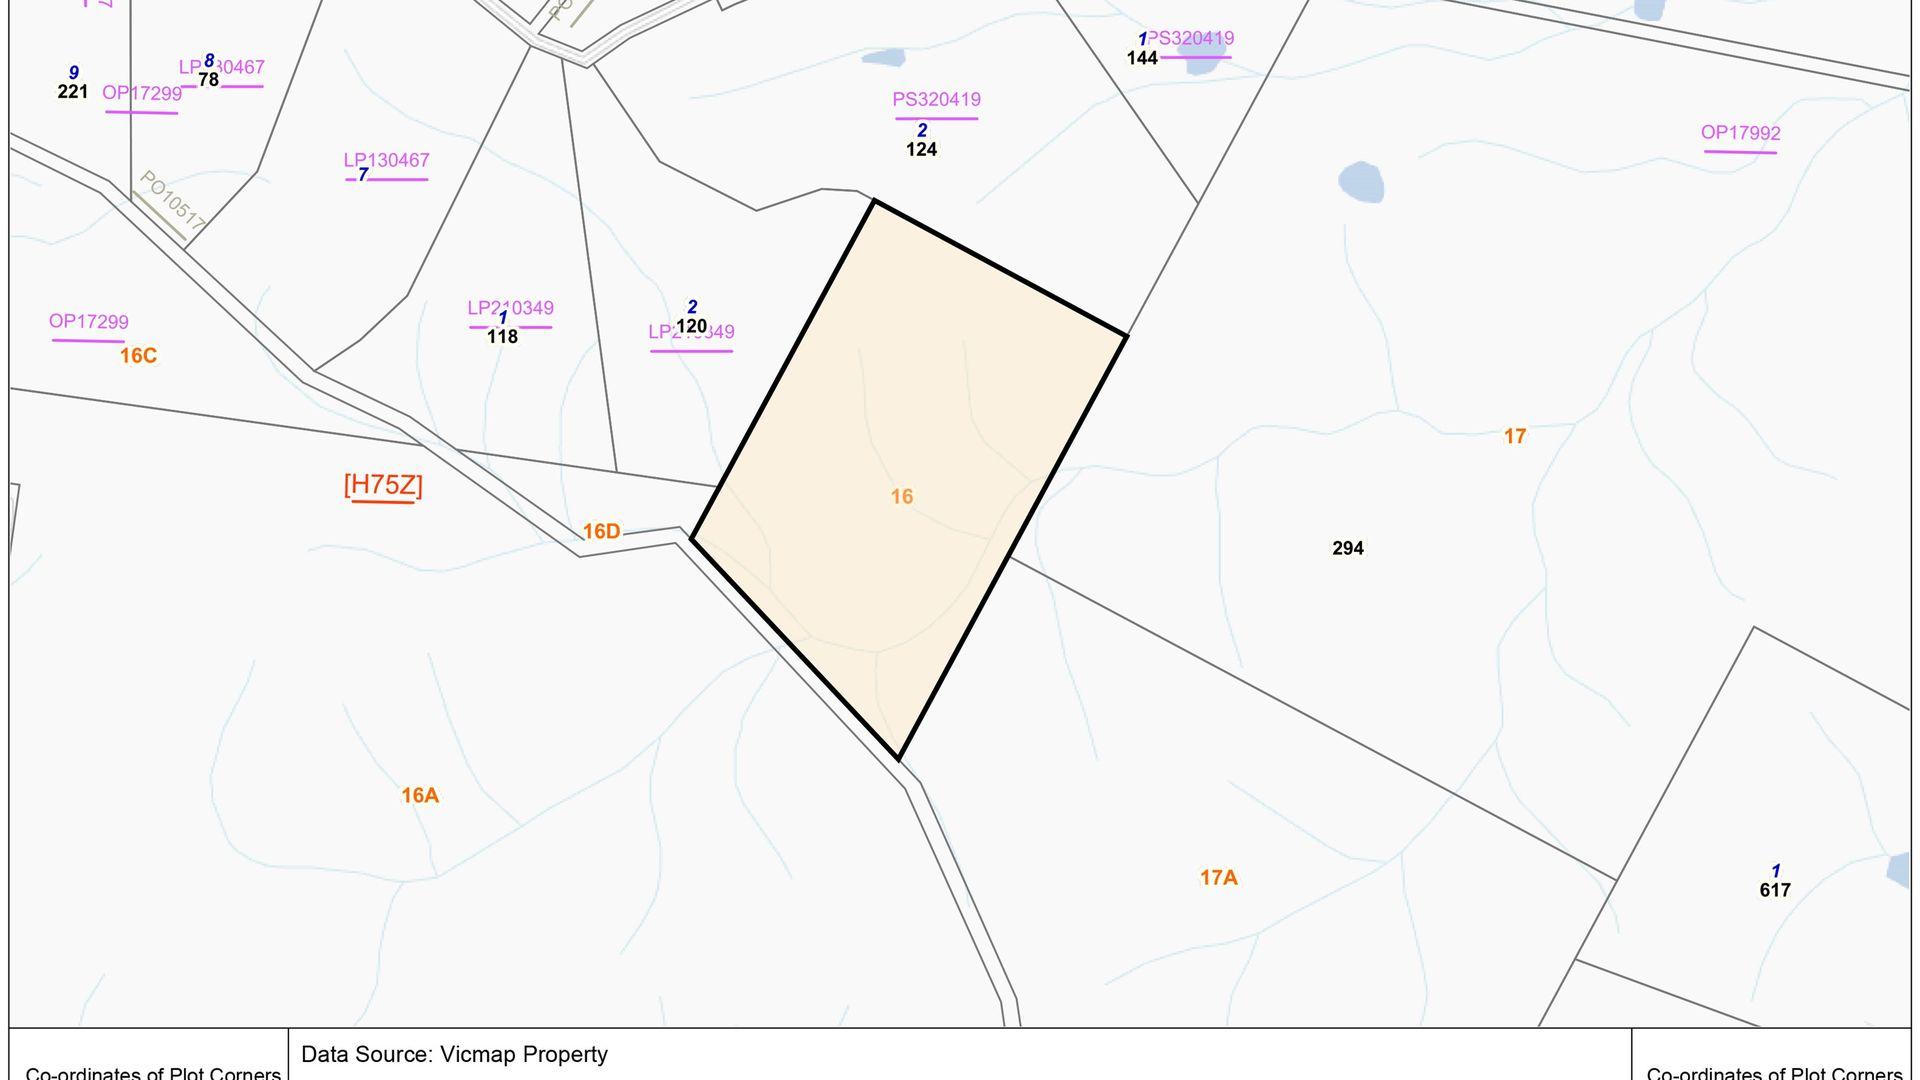 Lot 17, 17A, 16, 16A/294 Hylands Lane, Heathcote VIC 3523, Image 2